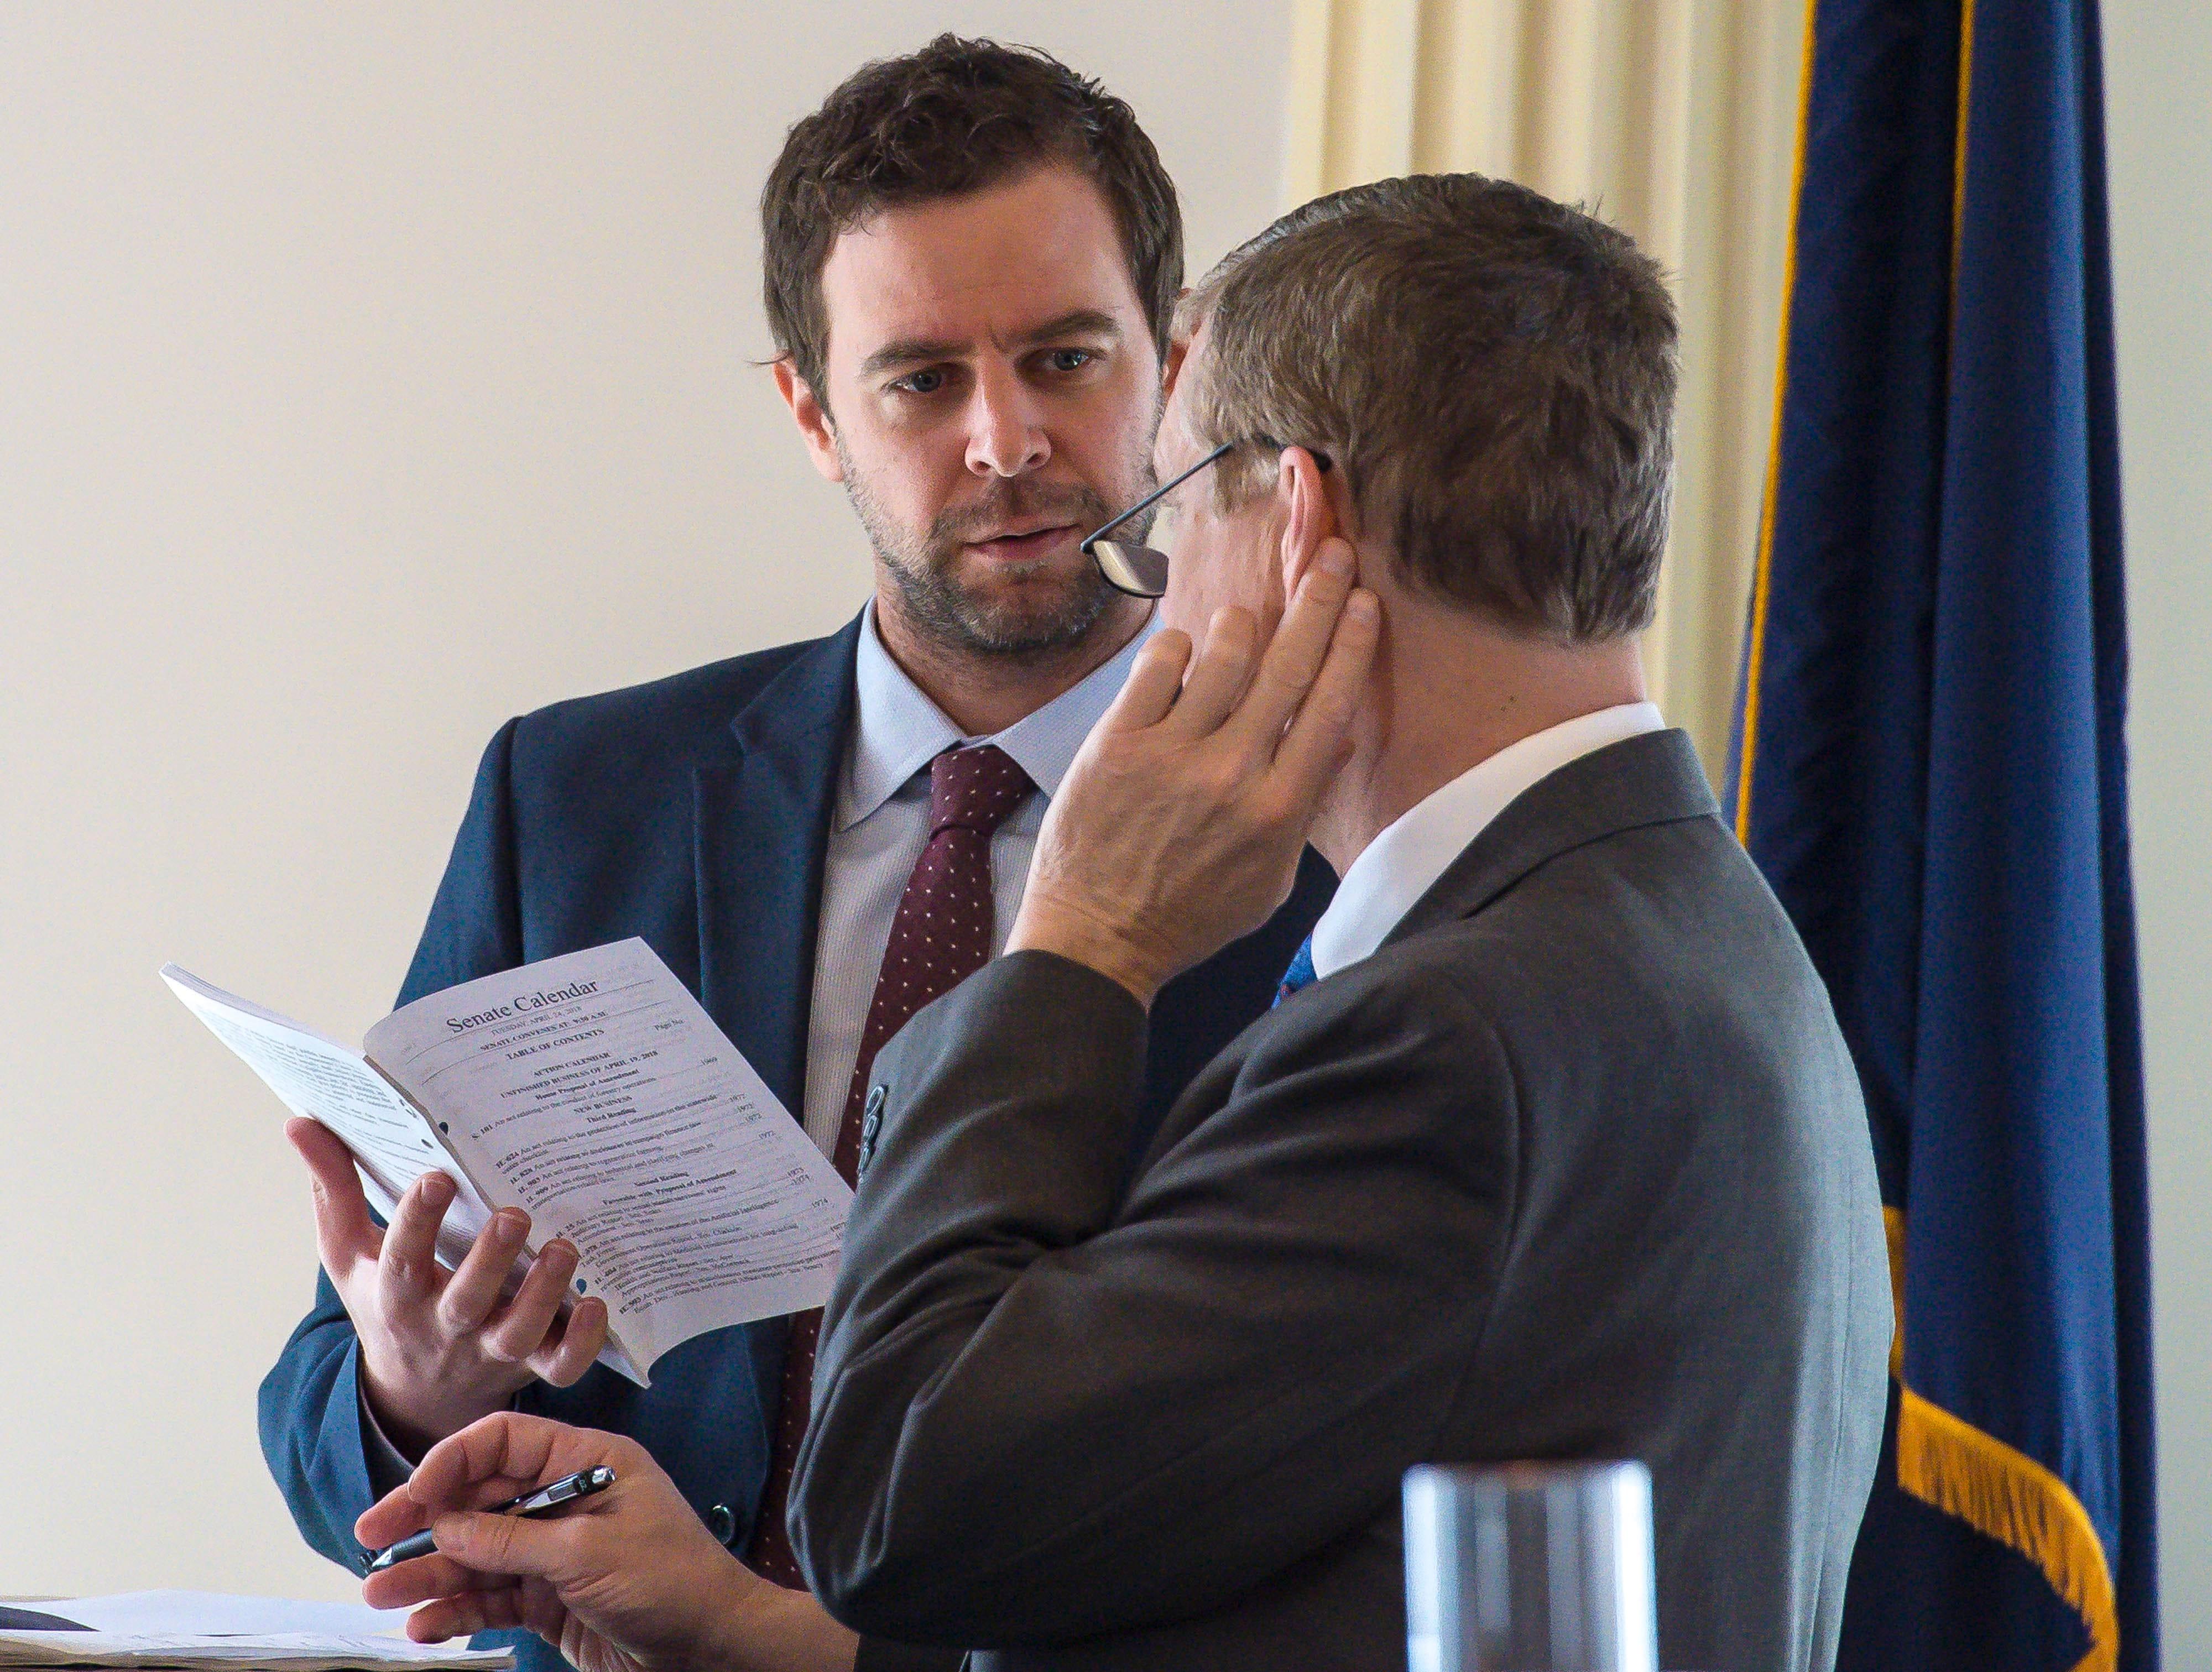 Domestic terrorism bill gets OK from Vermont lawmakers reacting to Fair Haven plot | Burlington Free Press